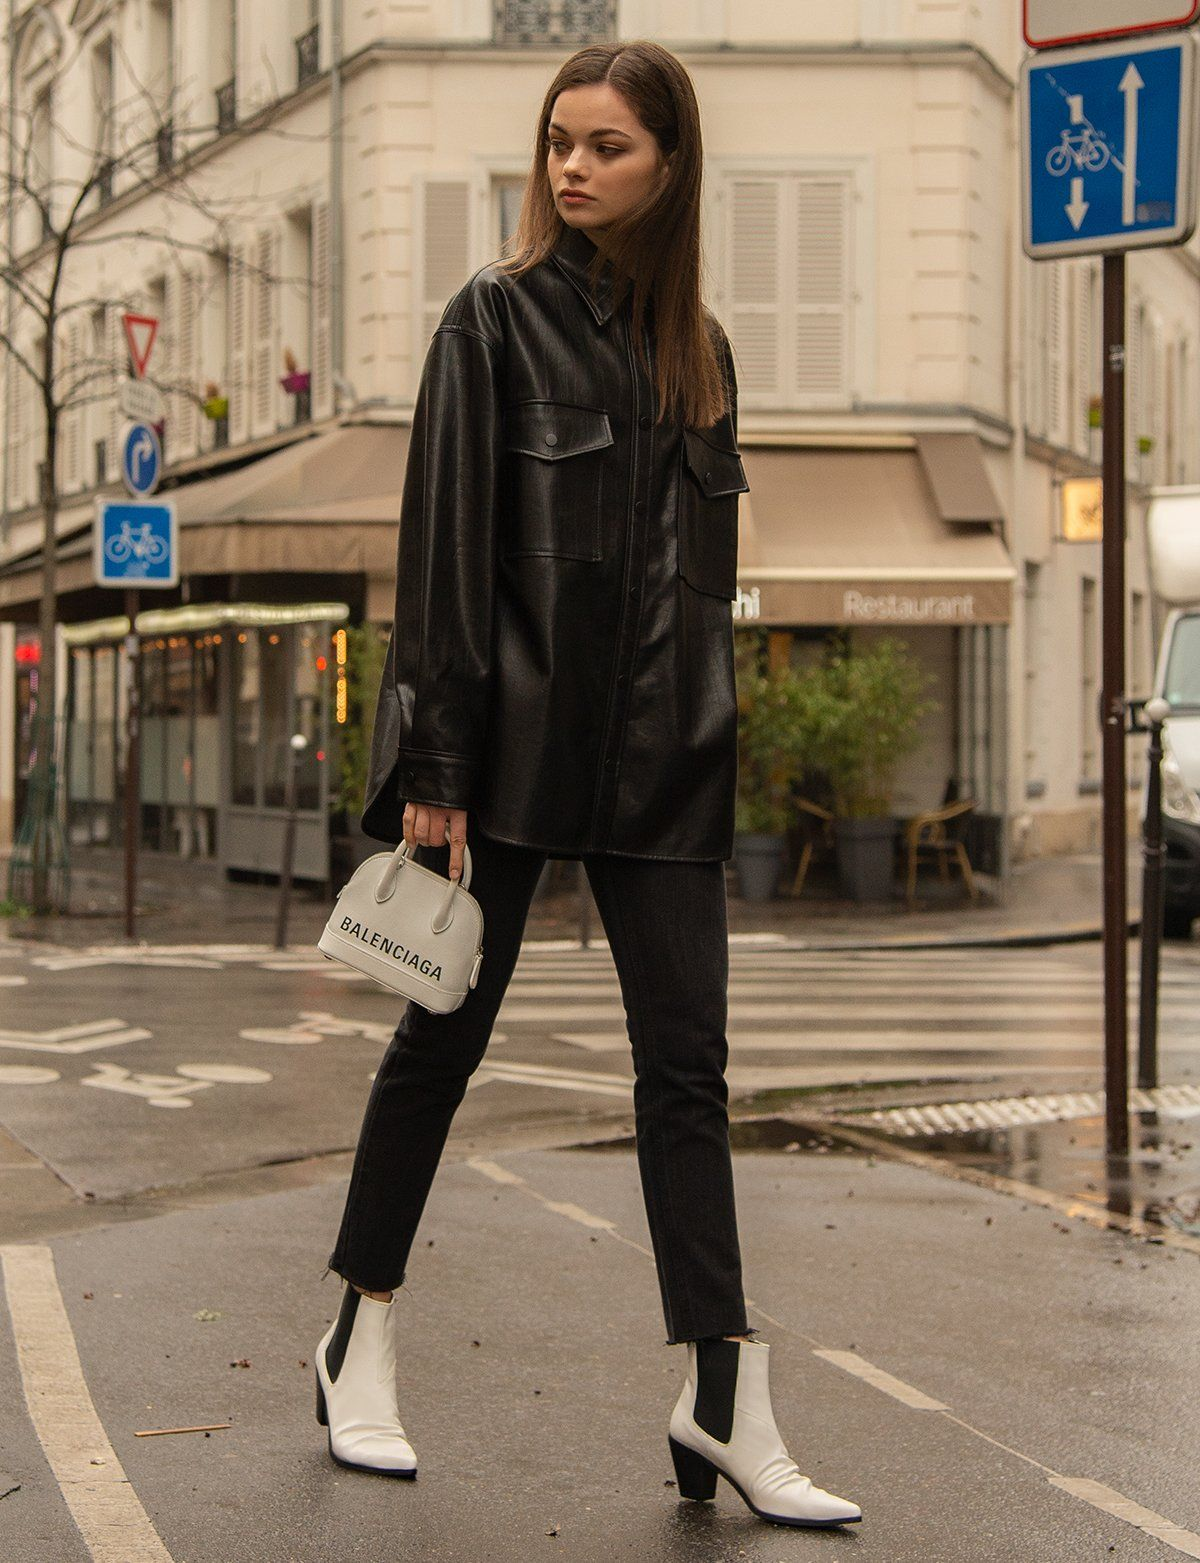 Black Vegan Leather Shirt   Leather shirt, Leather shirt outfit, Fashion